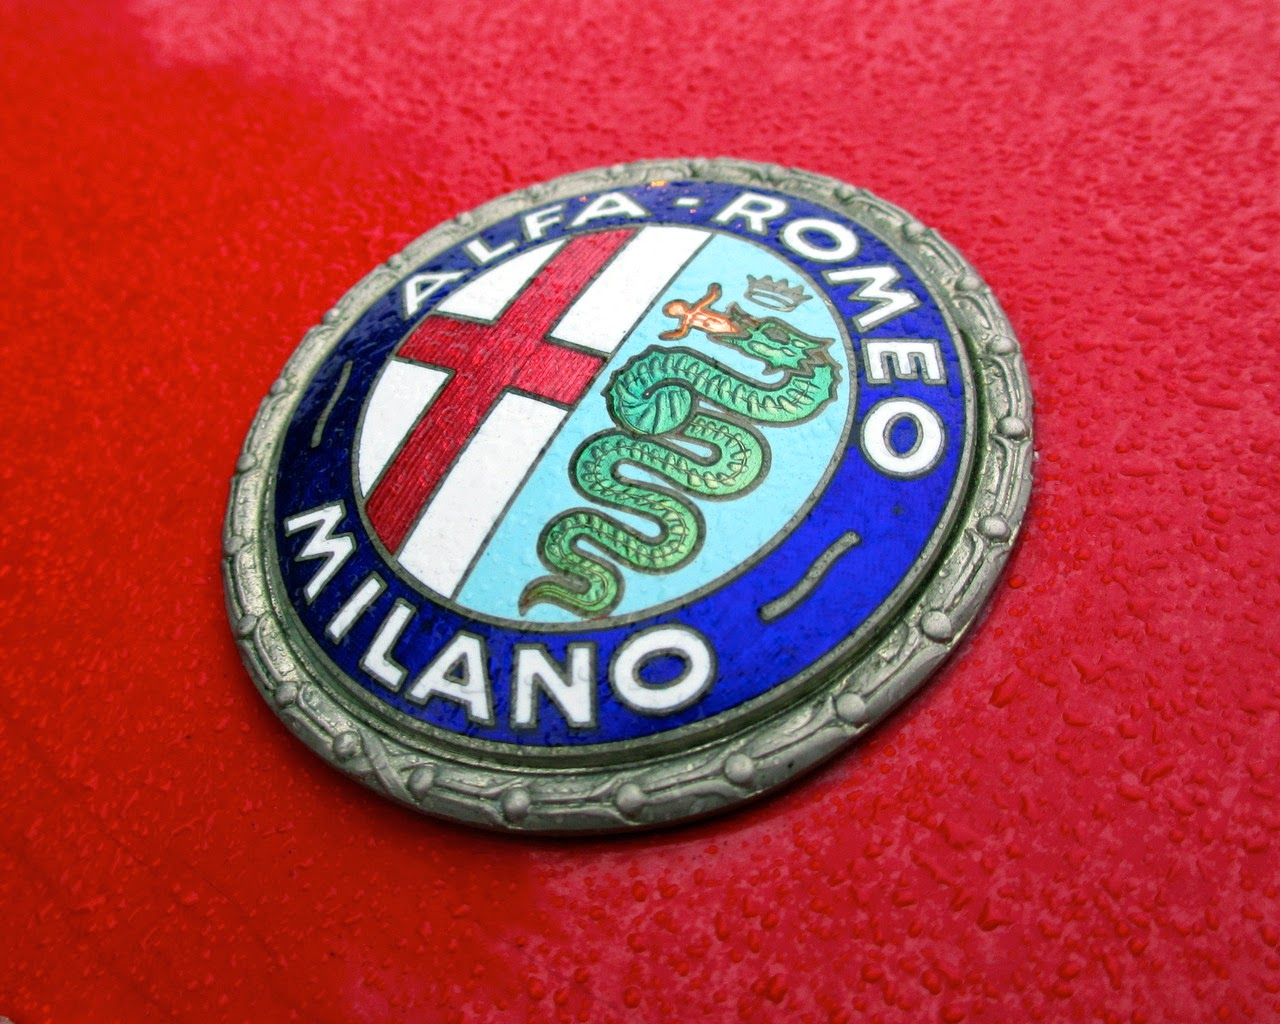 Pilotes Anciens The Alfa Romeo Badge Symbol